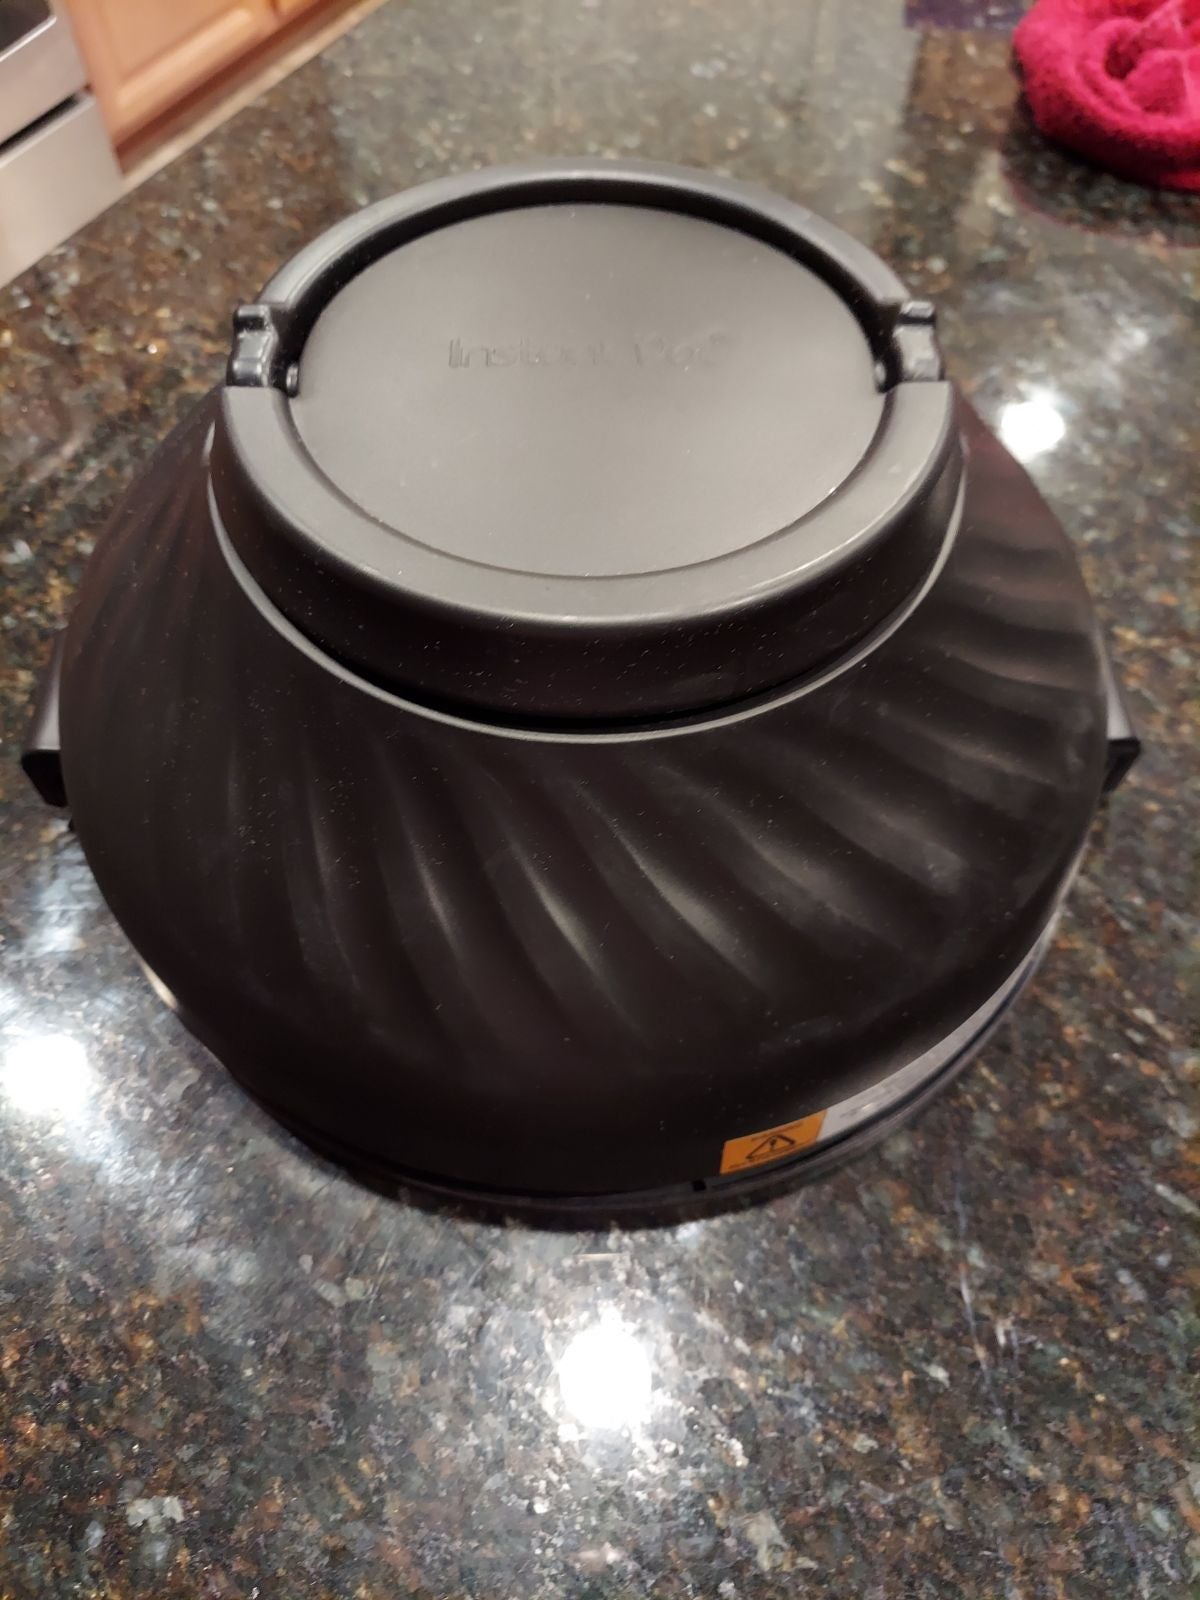 8qt air fryer lid (compatible with 8 qt